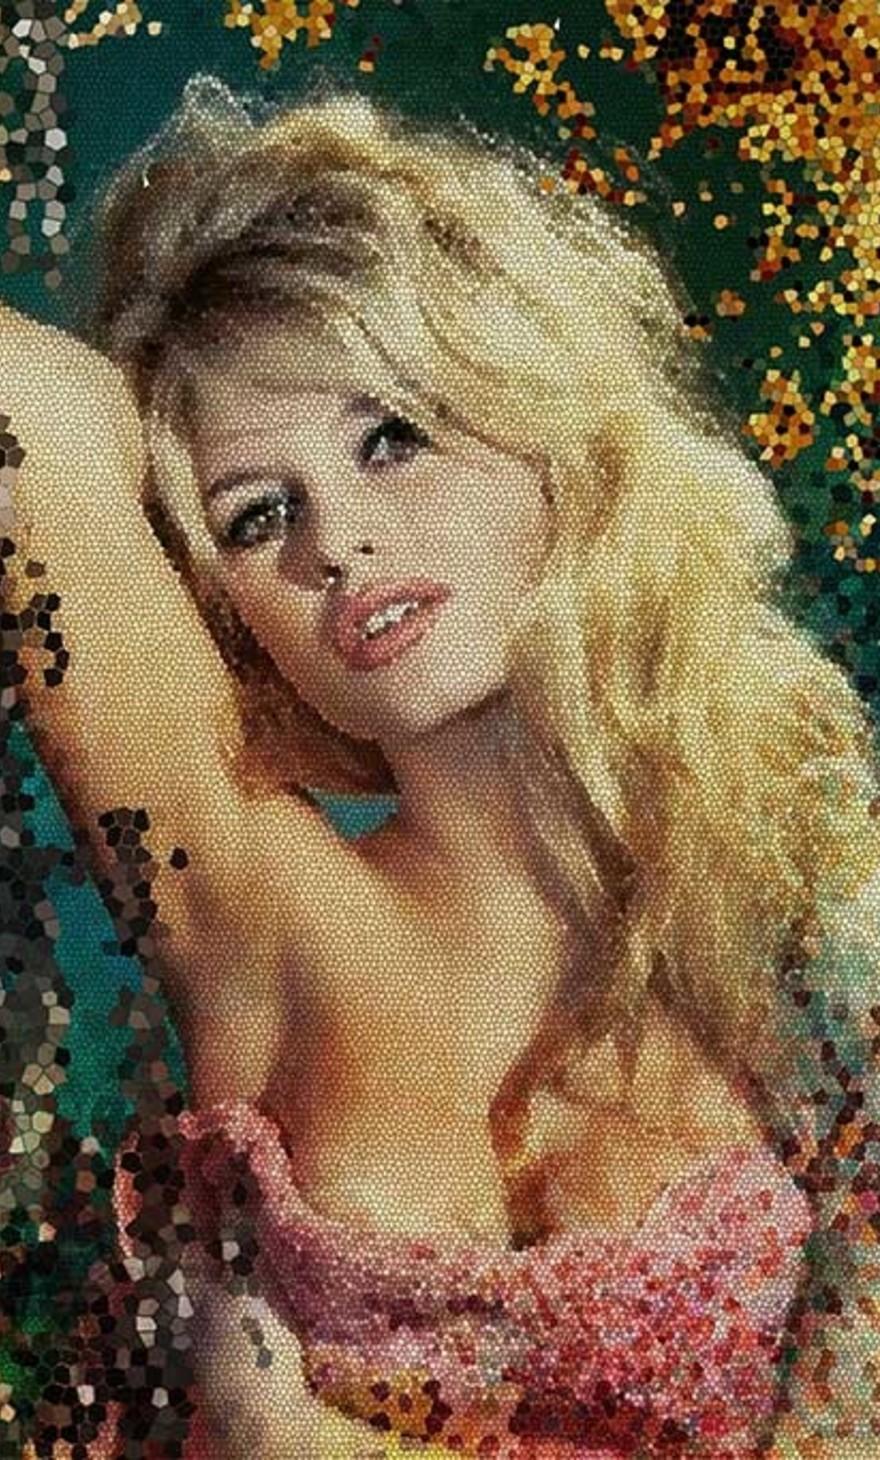 Mosaic Brigitte Bardot